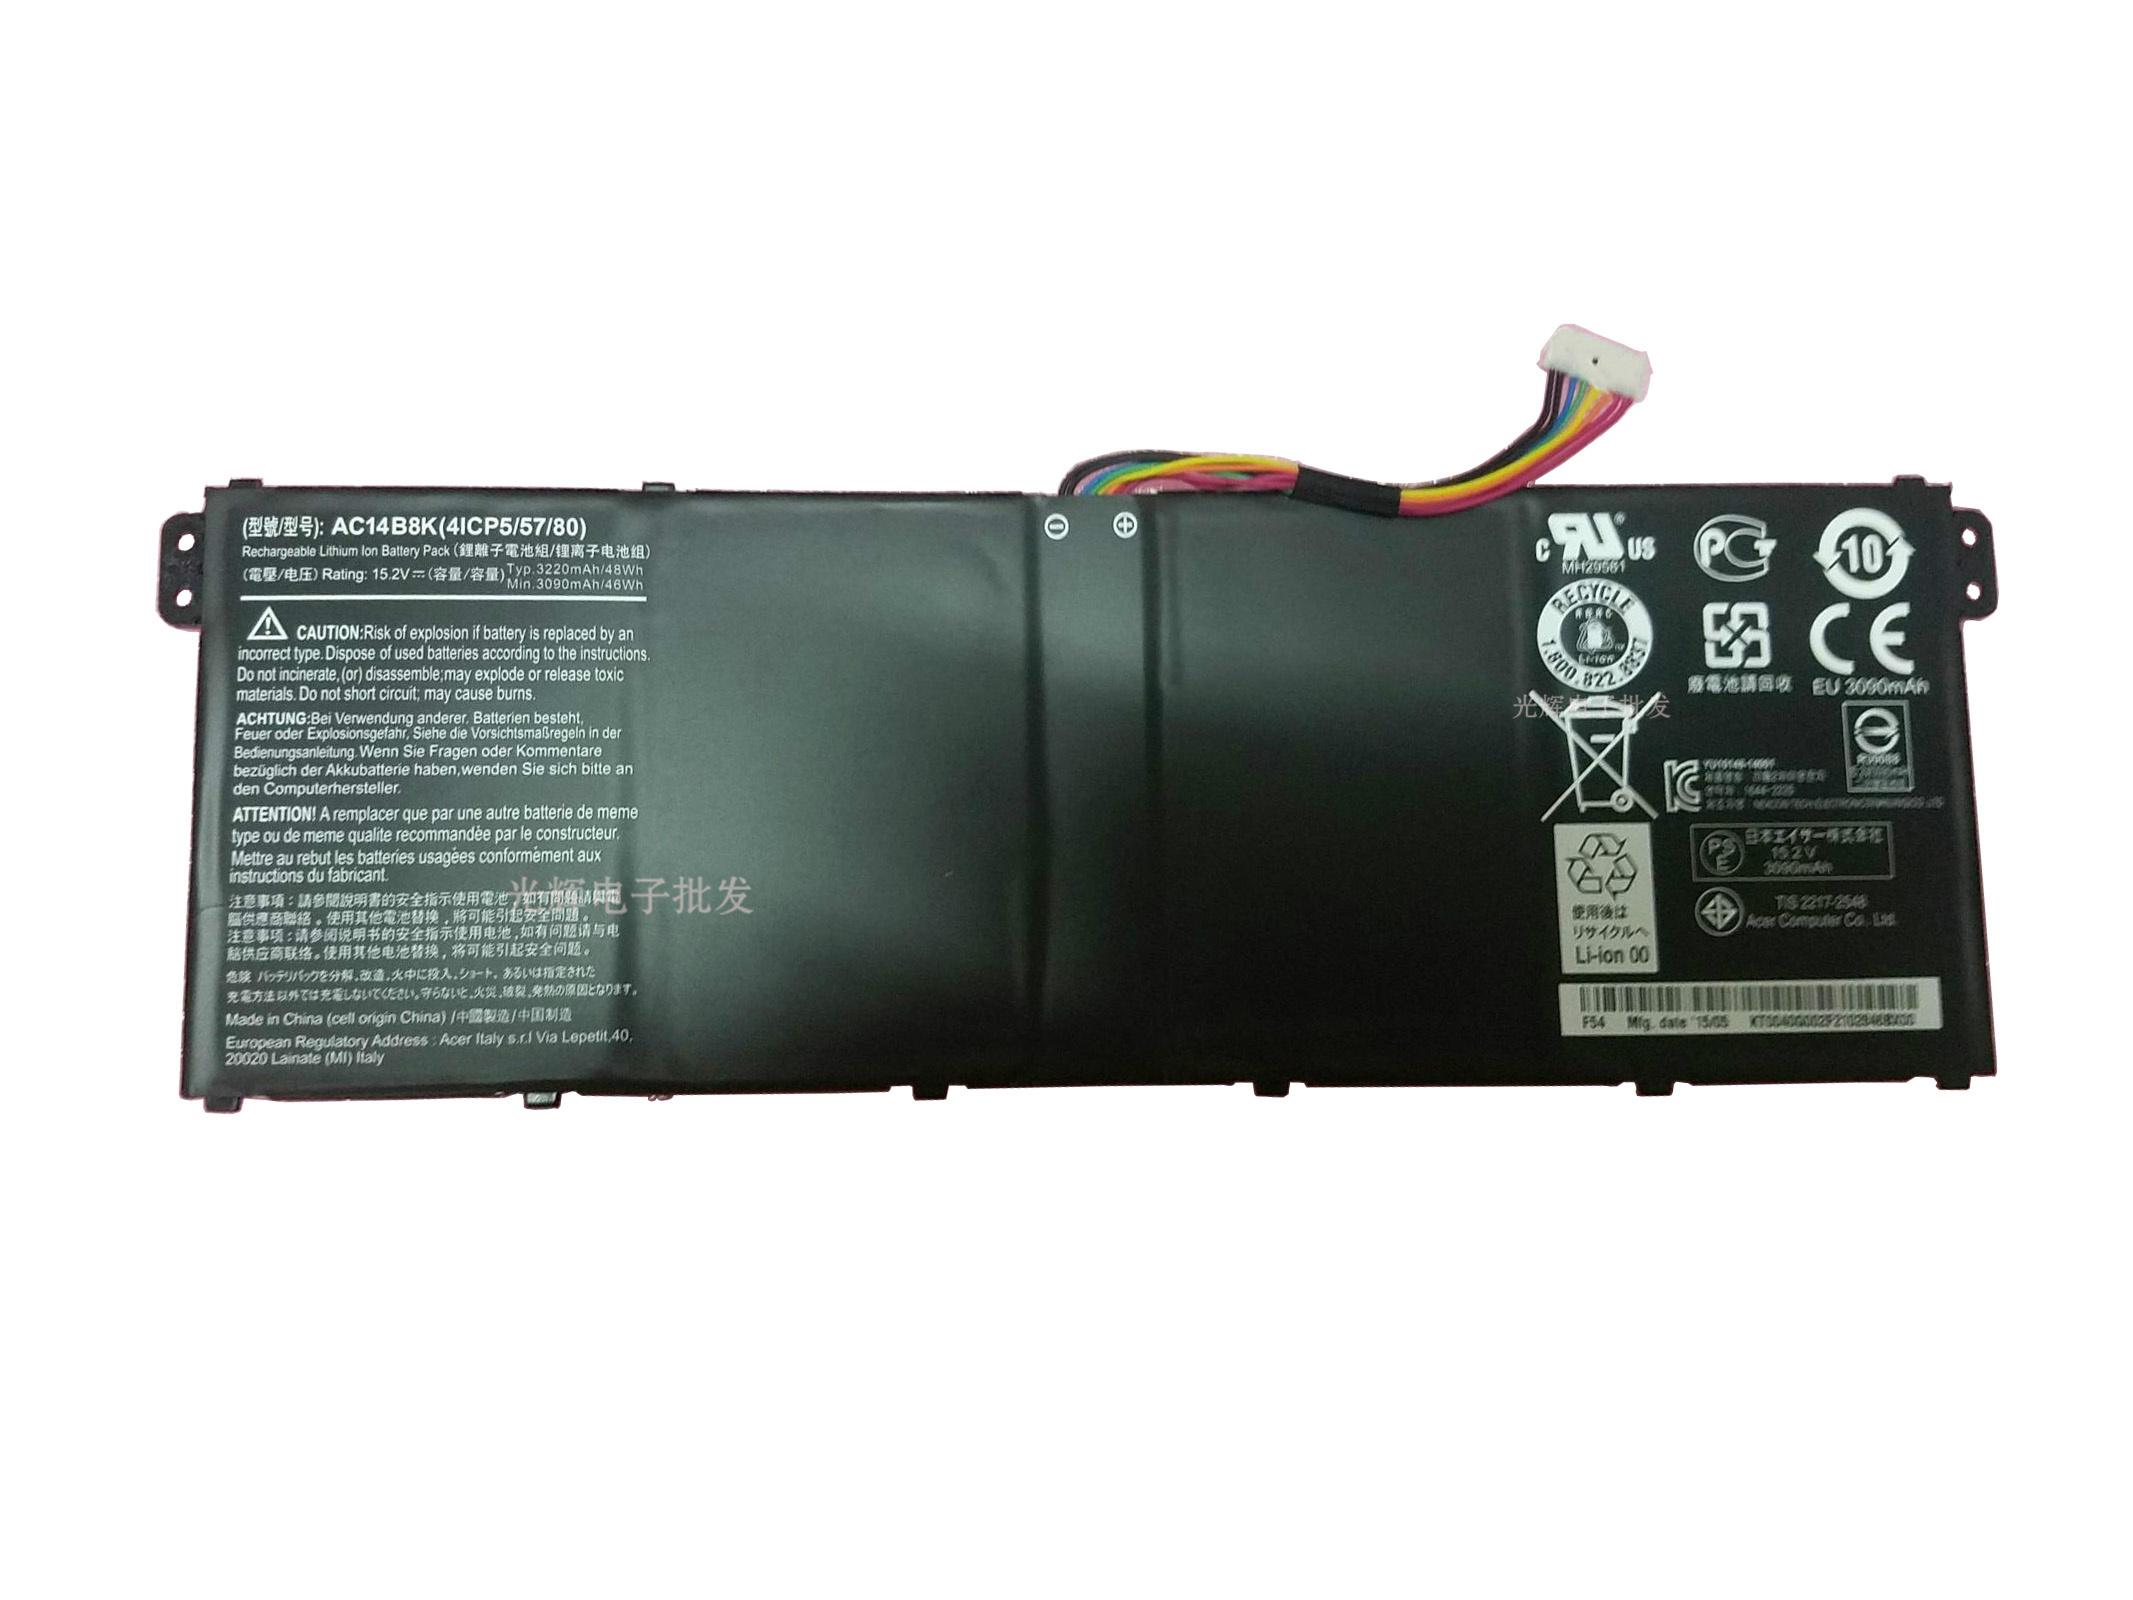 原装 ACER宏碁 ES1-531 B115 R3-131T AC14B3K AC14B8K笔记本电池